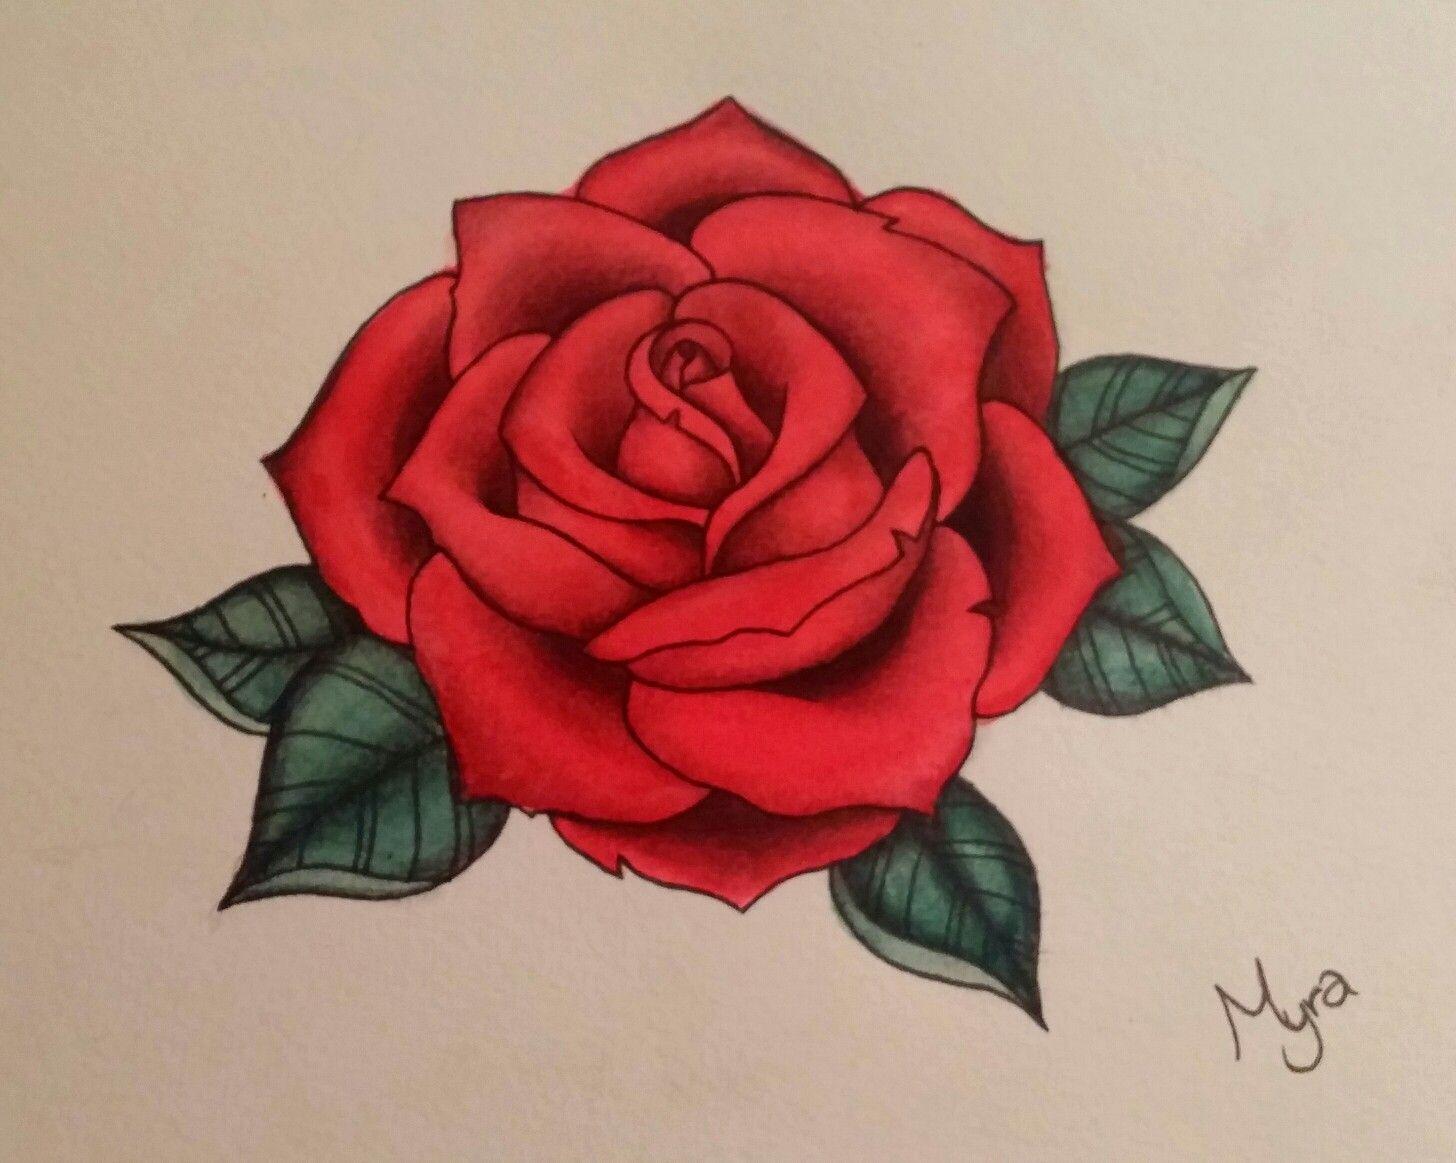 Rosedrawingarttattooflashcoloredpencil my drawings pinterest